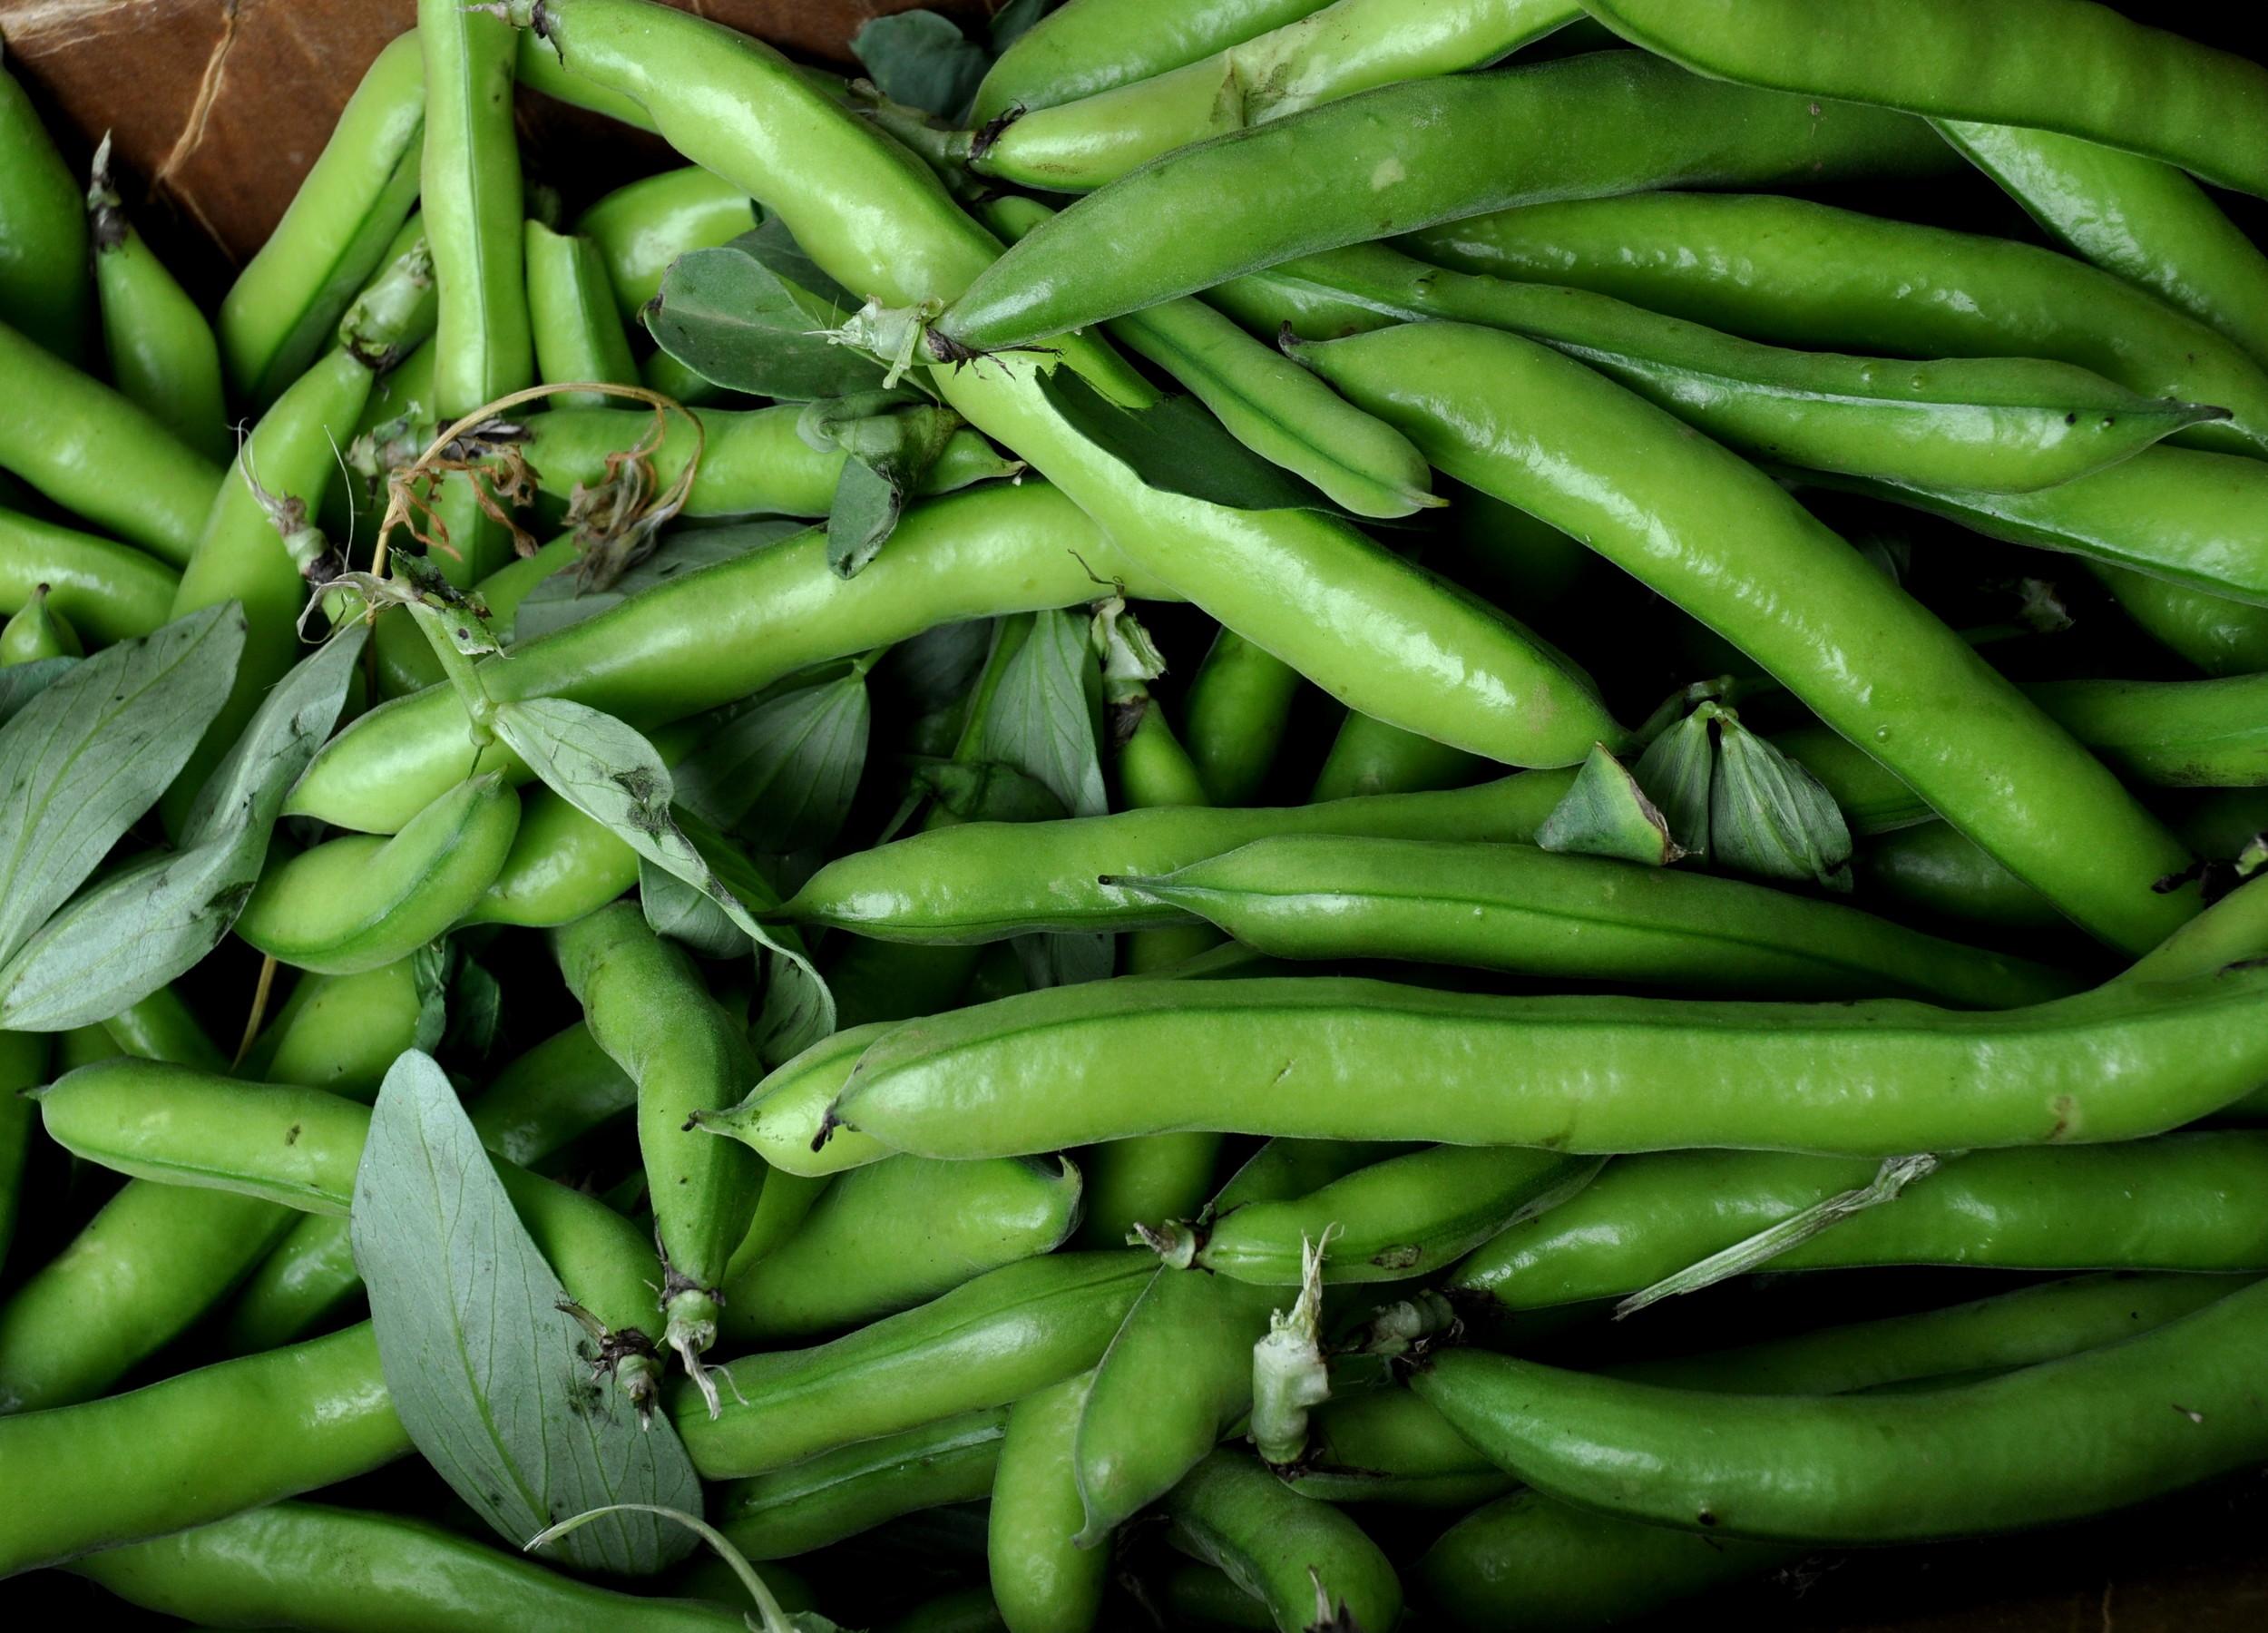 Fresh fava beans from Alvarez Organic Farms. Photo copyright 2011 by Zachary D. Lyons.